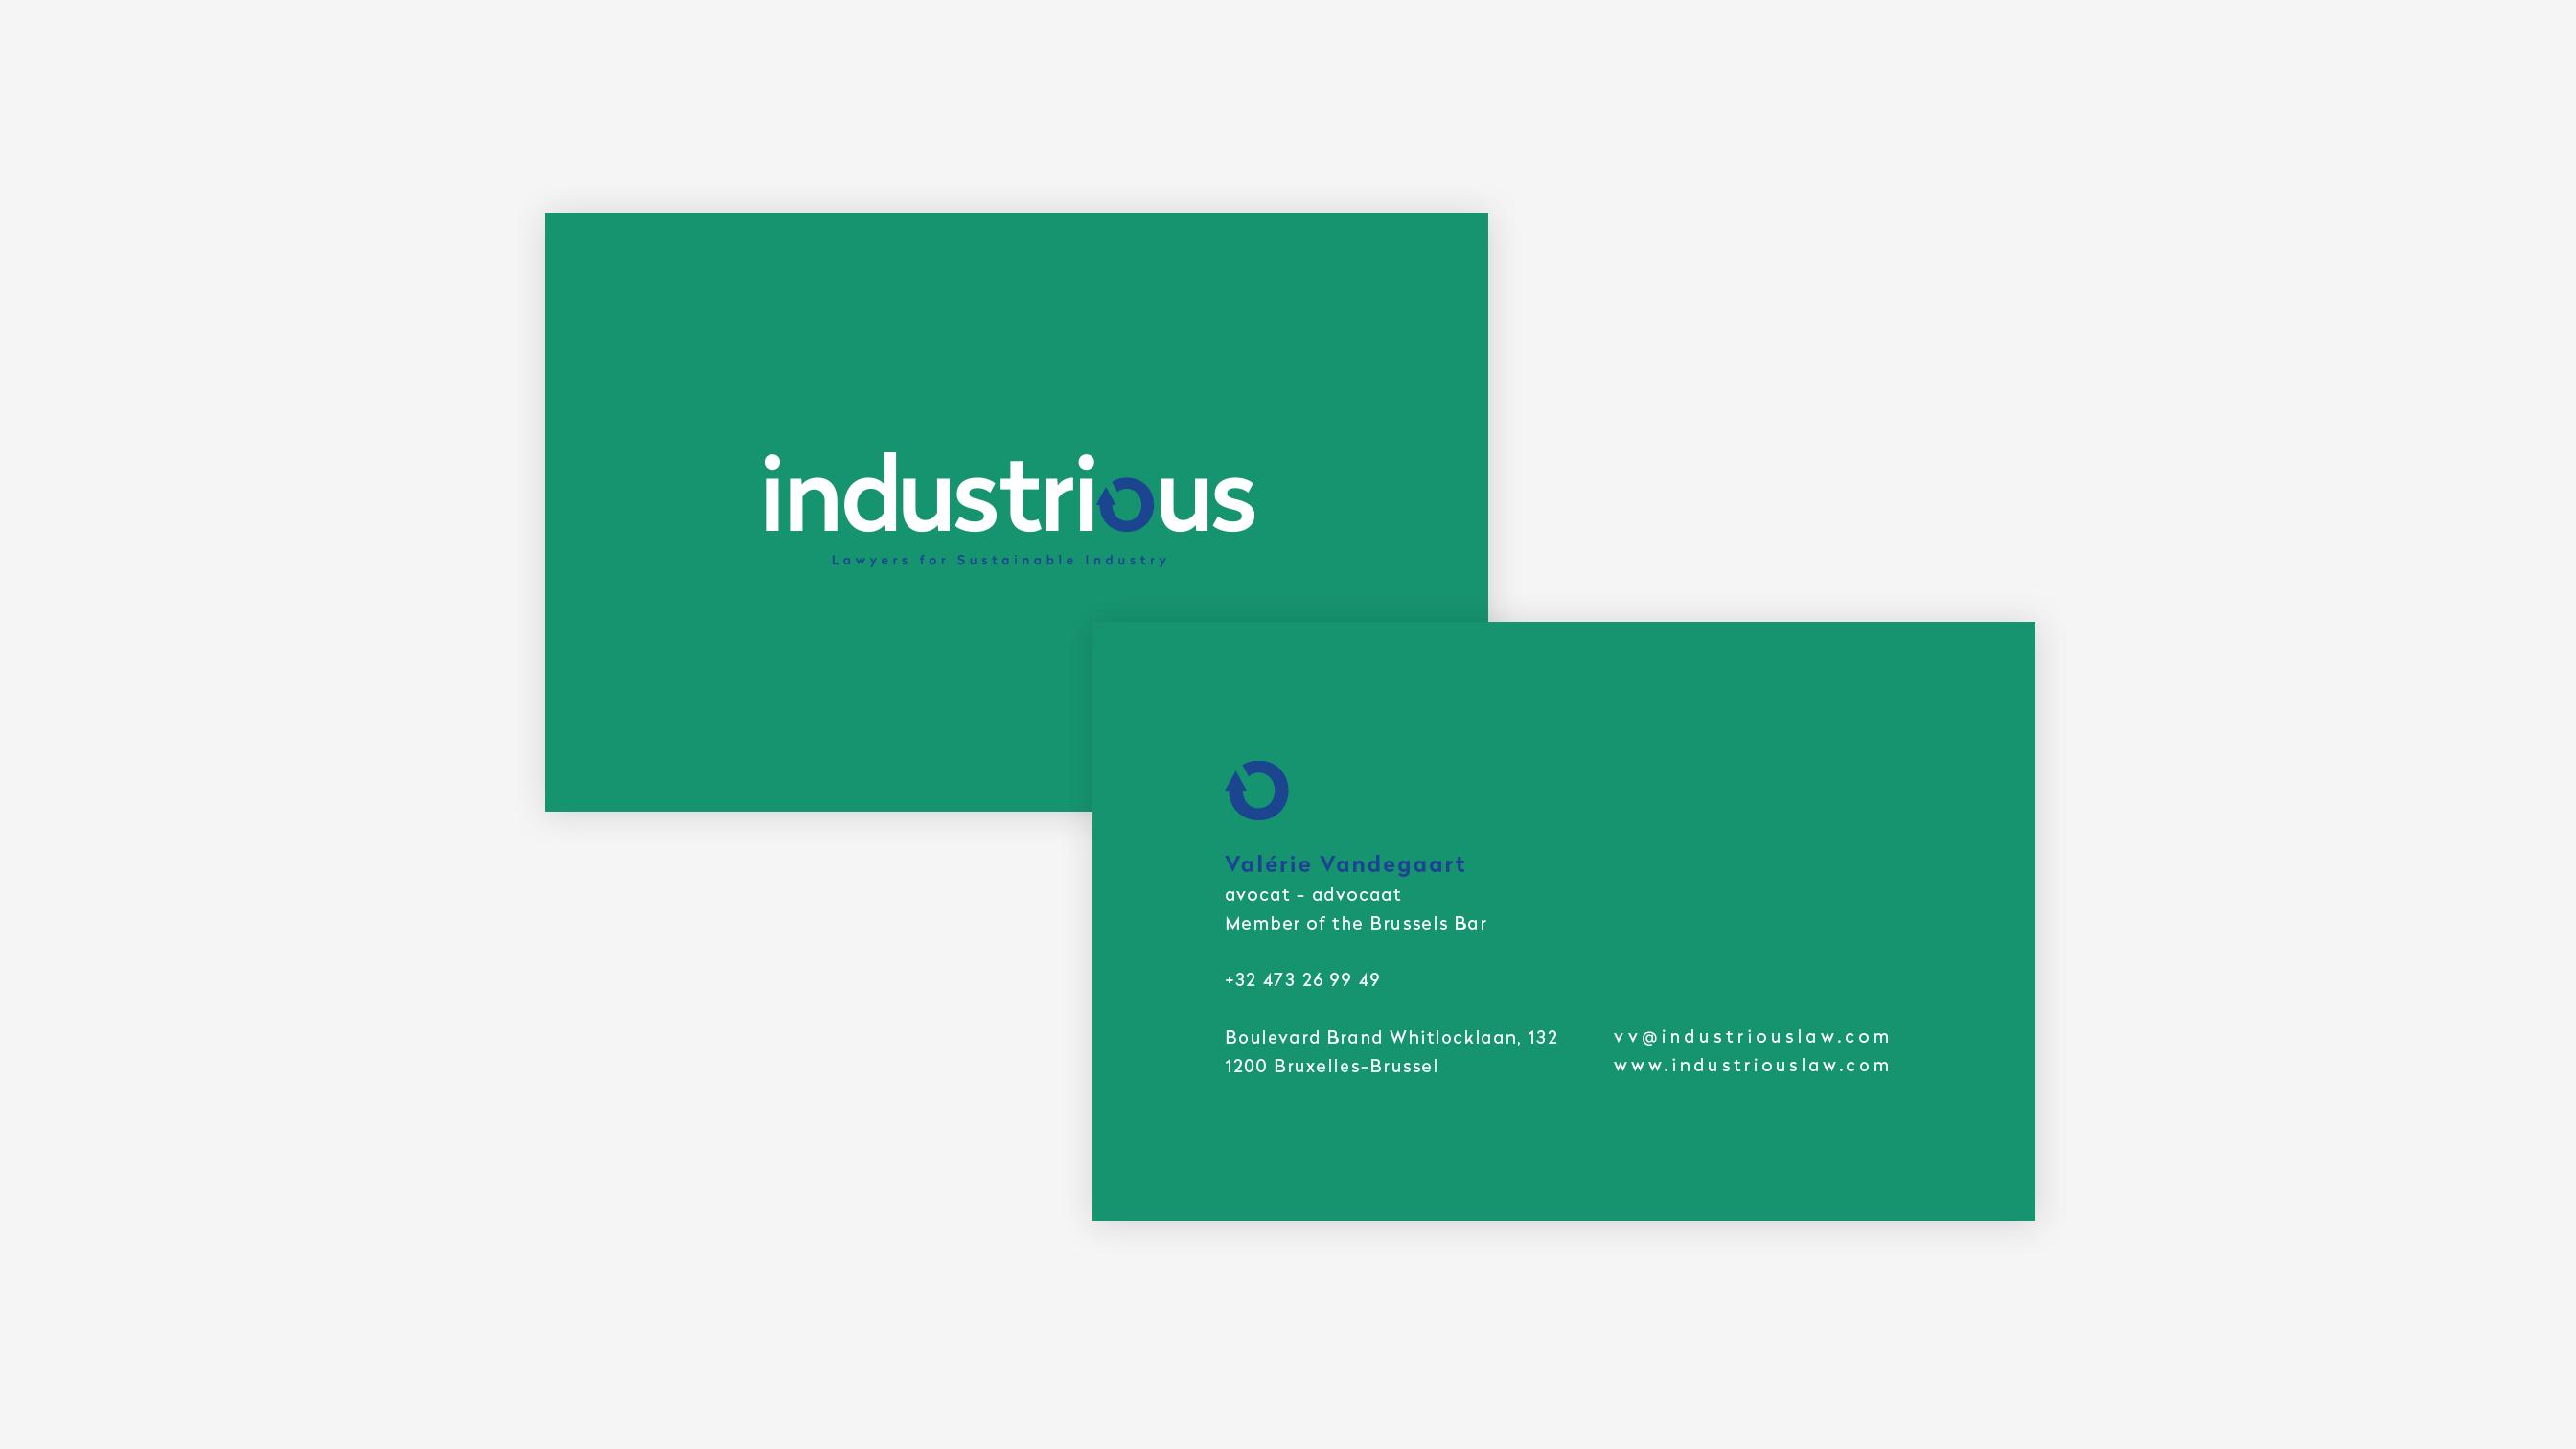 06-industrious-pikteo-logotype